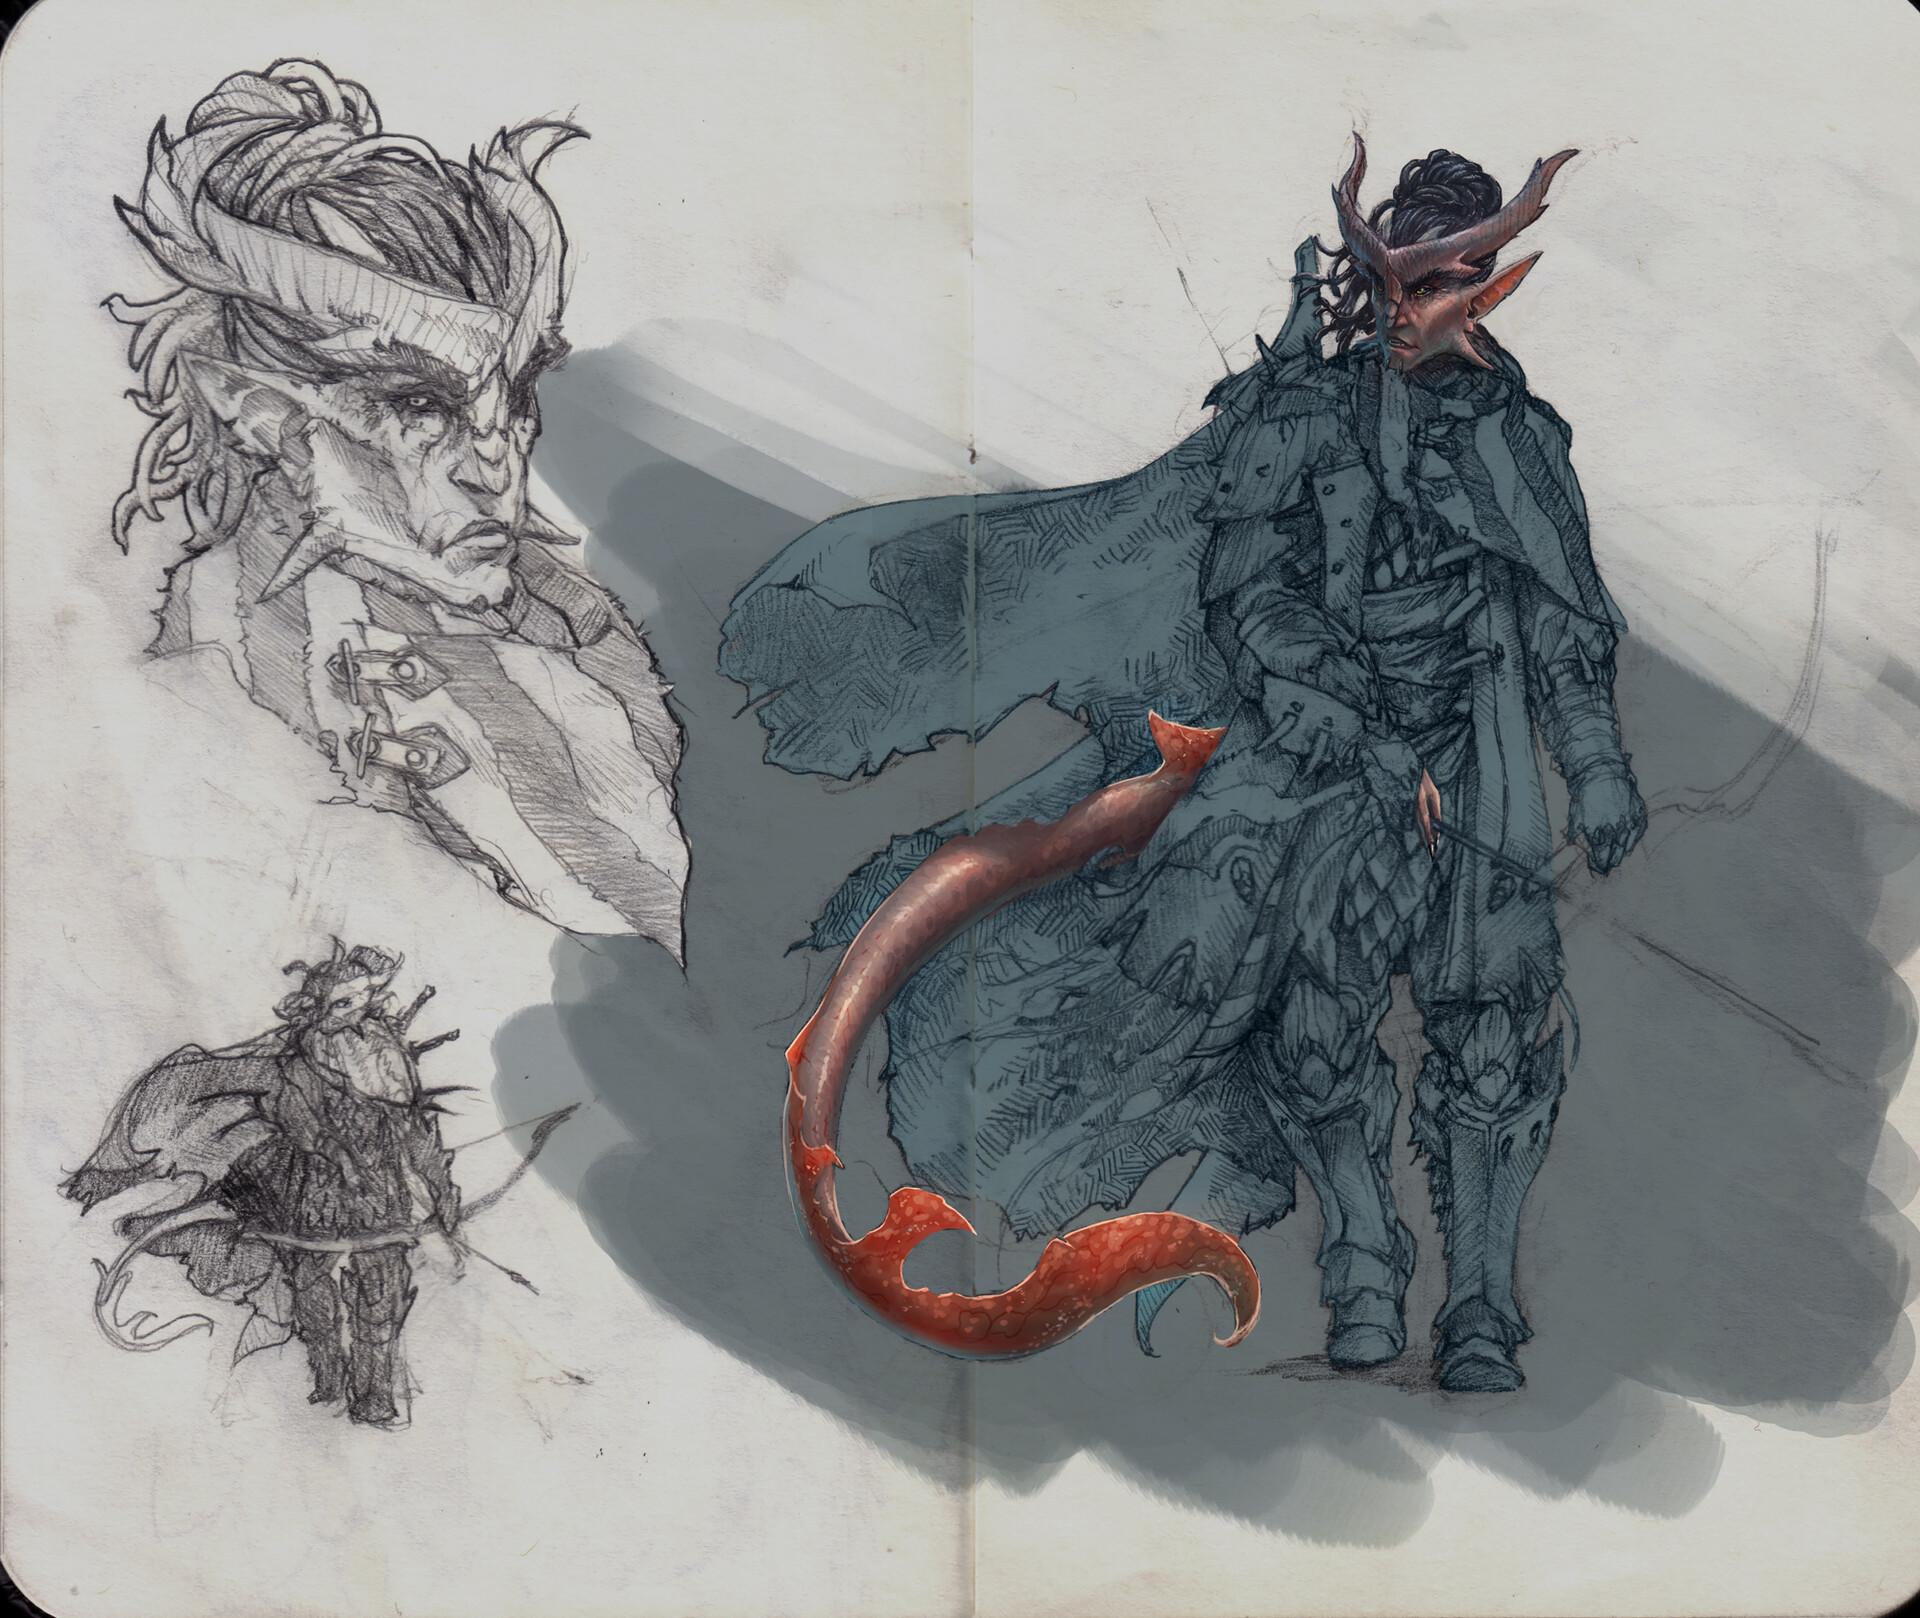 Initial pencil sketch + Base coloring